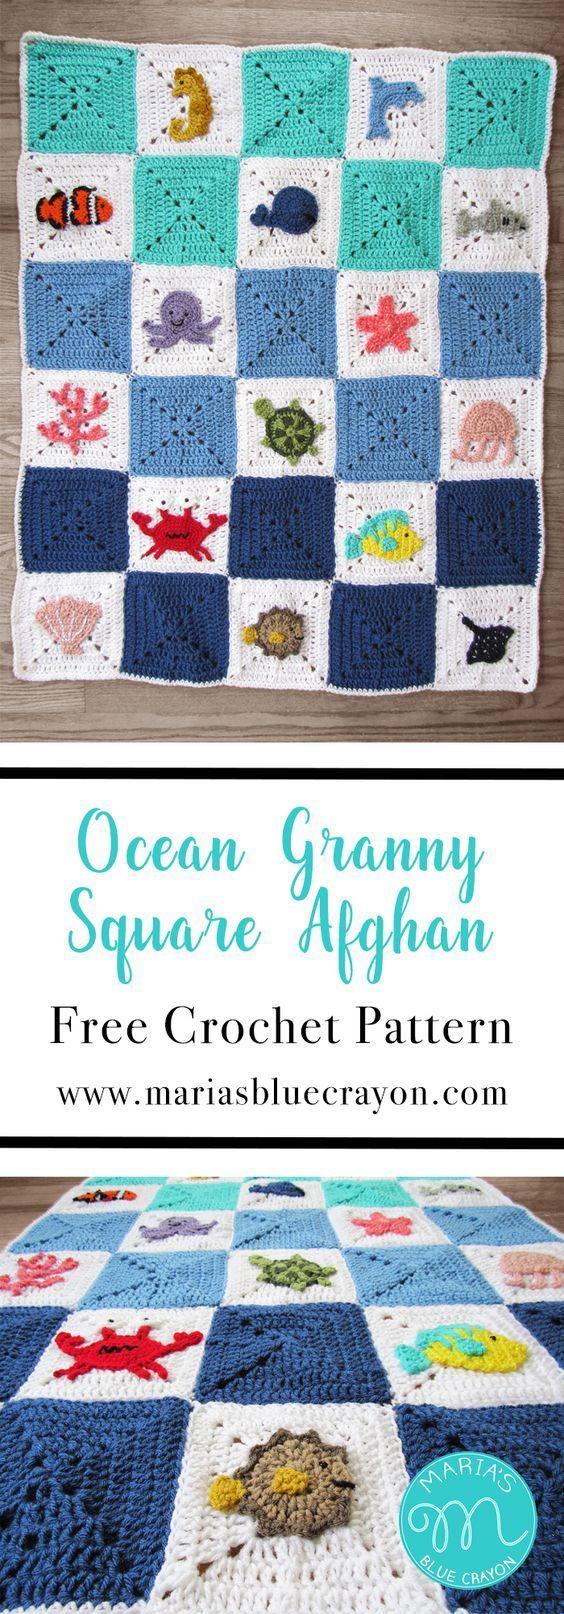 Ocean Granny Square Afghan Free Crochet Pattern.